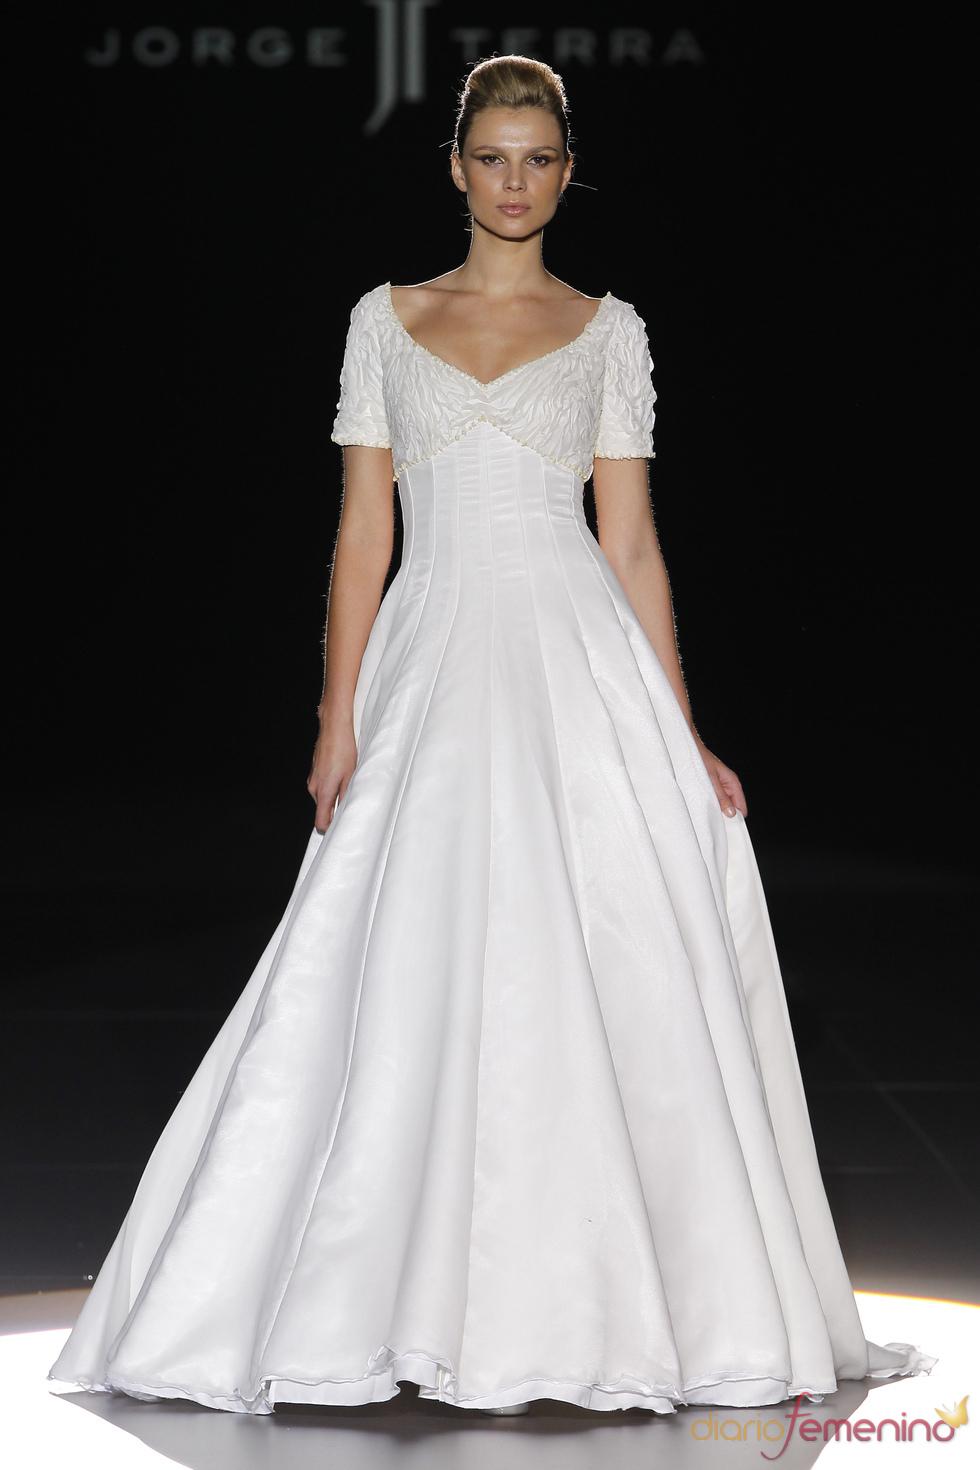 Elegante vestido de novia de Jorge Terra